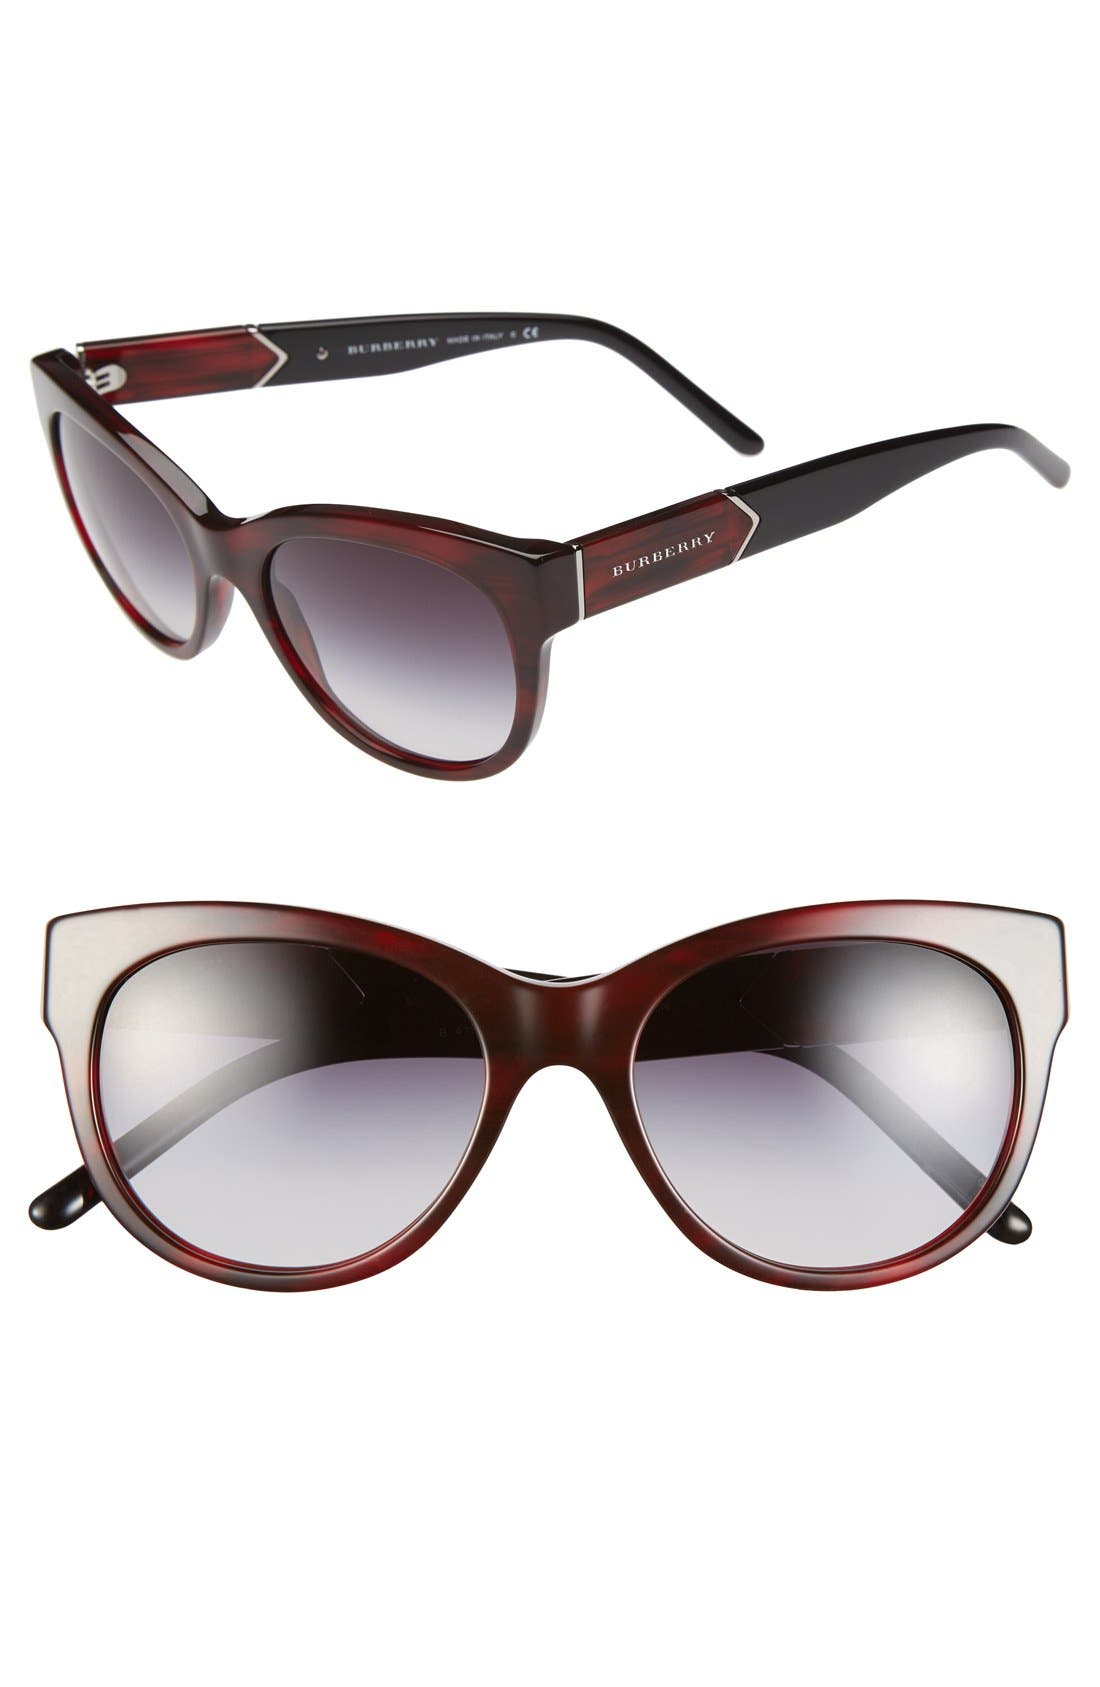 Alternate Image 1 Selected - Burberry 'Phantos' 53mm Sunglasses